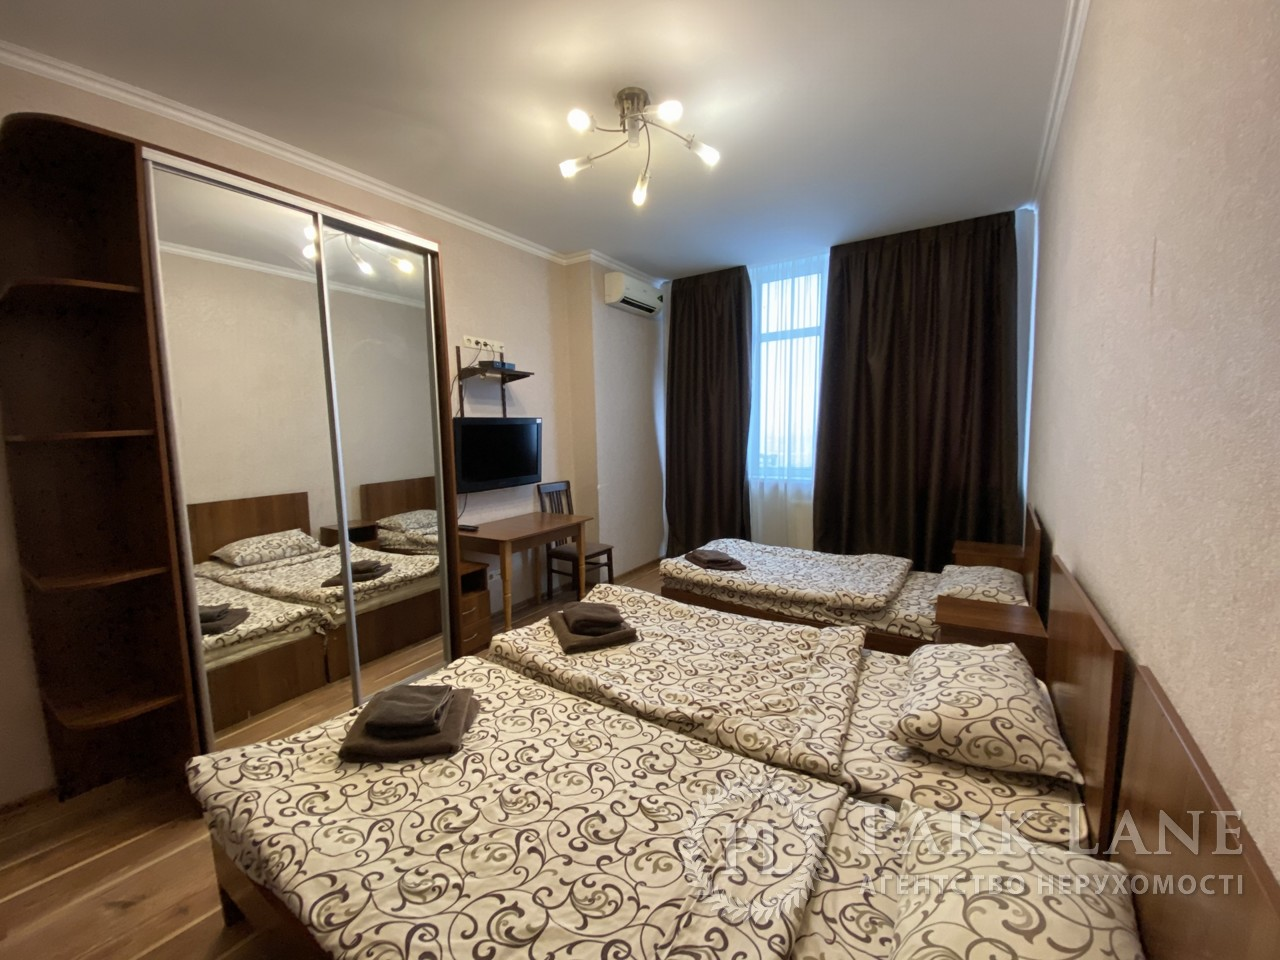 Квартира ул. Белорусская, 3, Киев, J-30527 - Фото 3